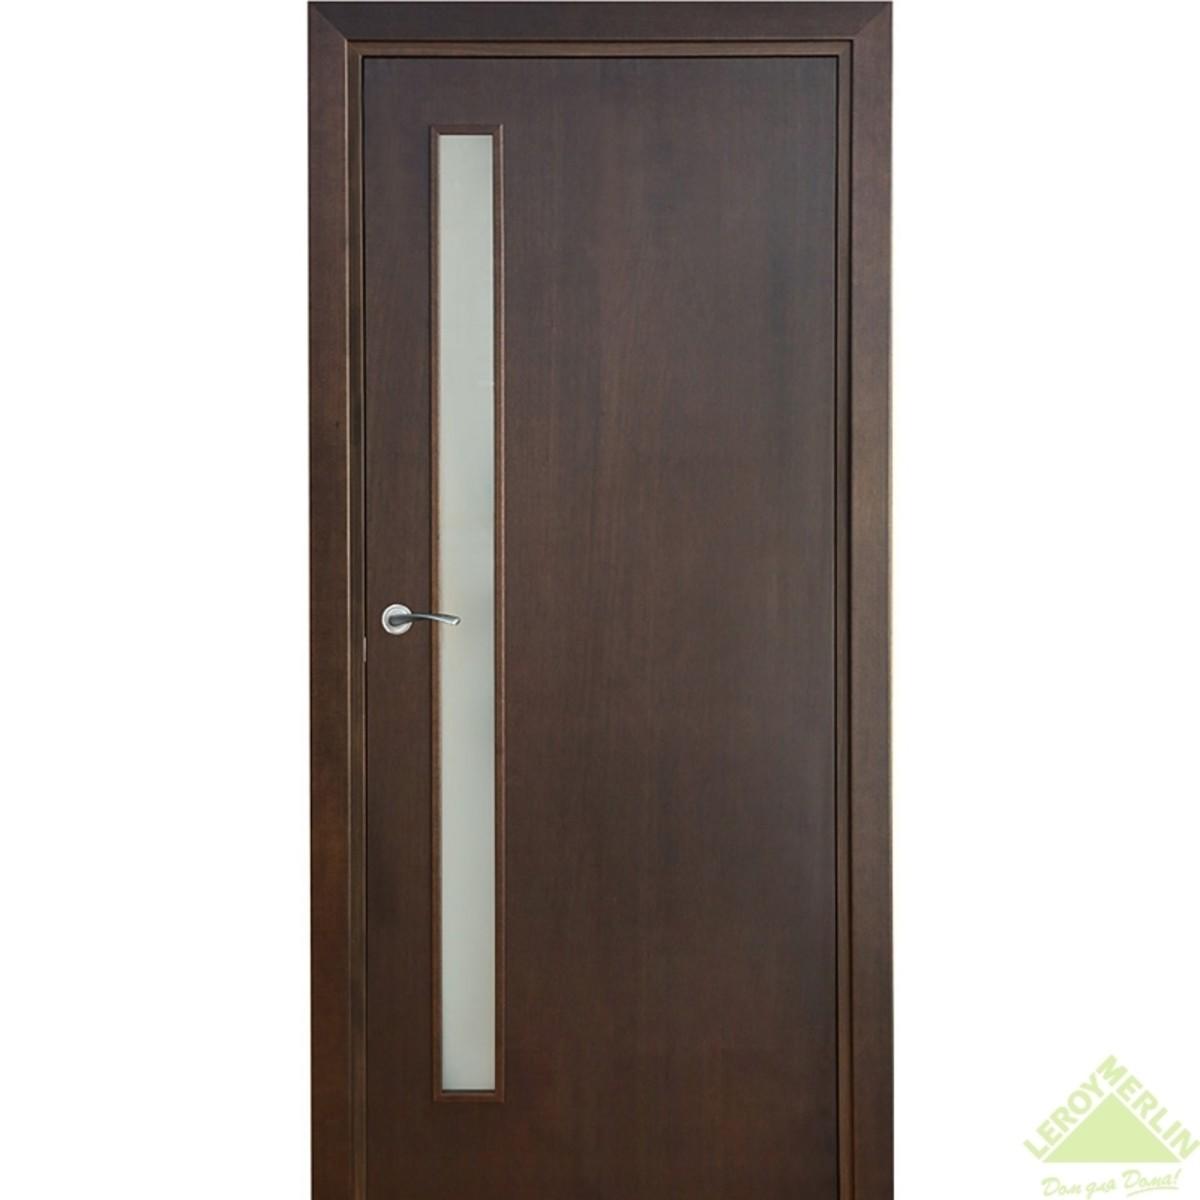 Дверь межкомнатная остеклённая Vario Сатин 601 900x2000 мм махагон